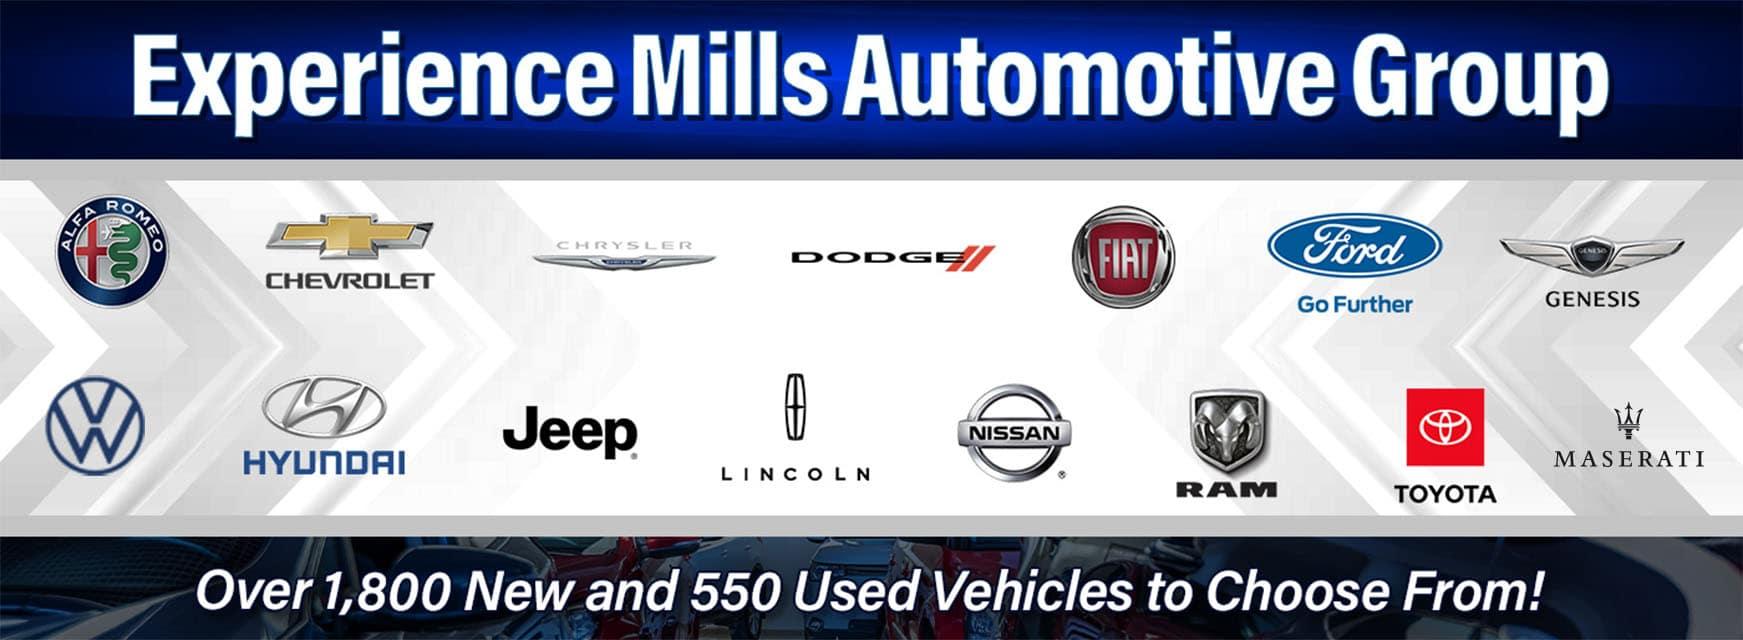 SLCJ77421-01-Generic-Mills-Auto-Group-Graphics-SlidesMAG